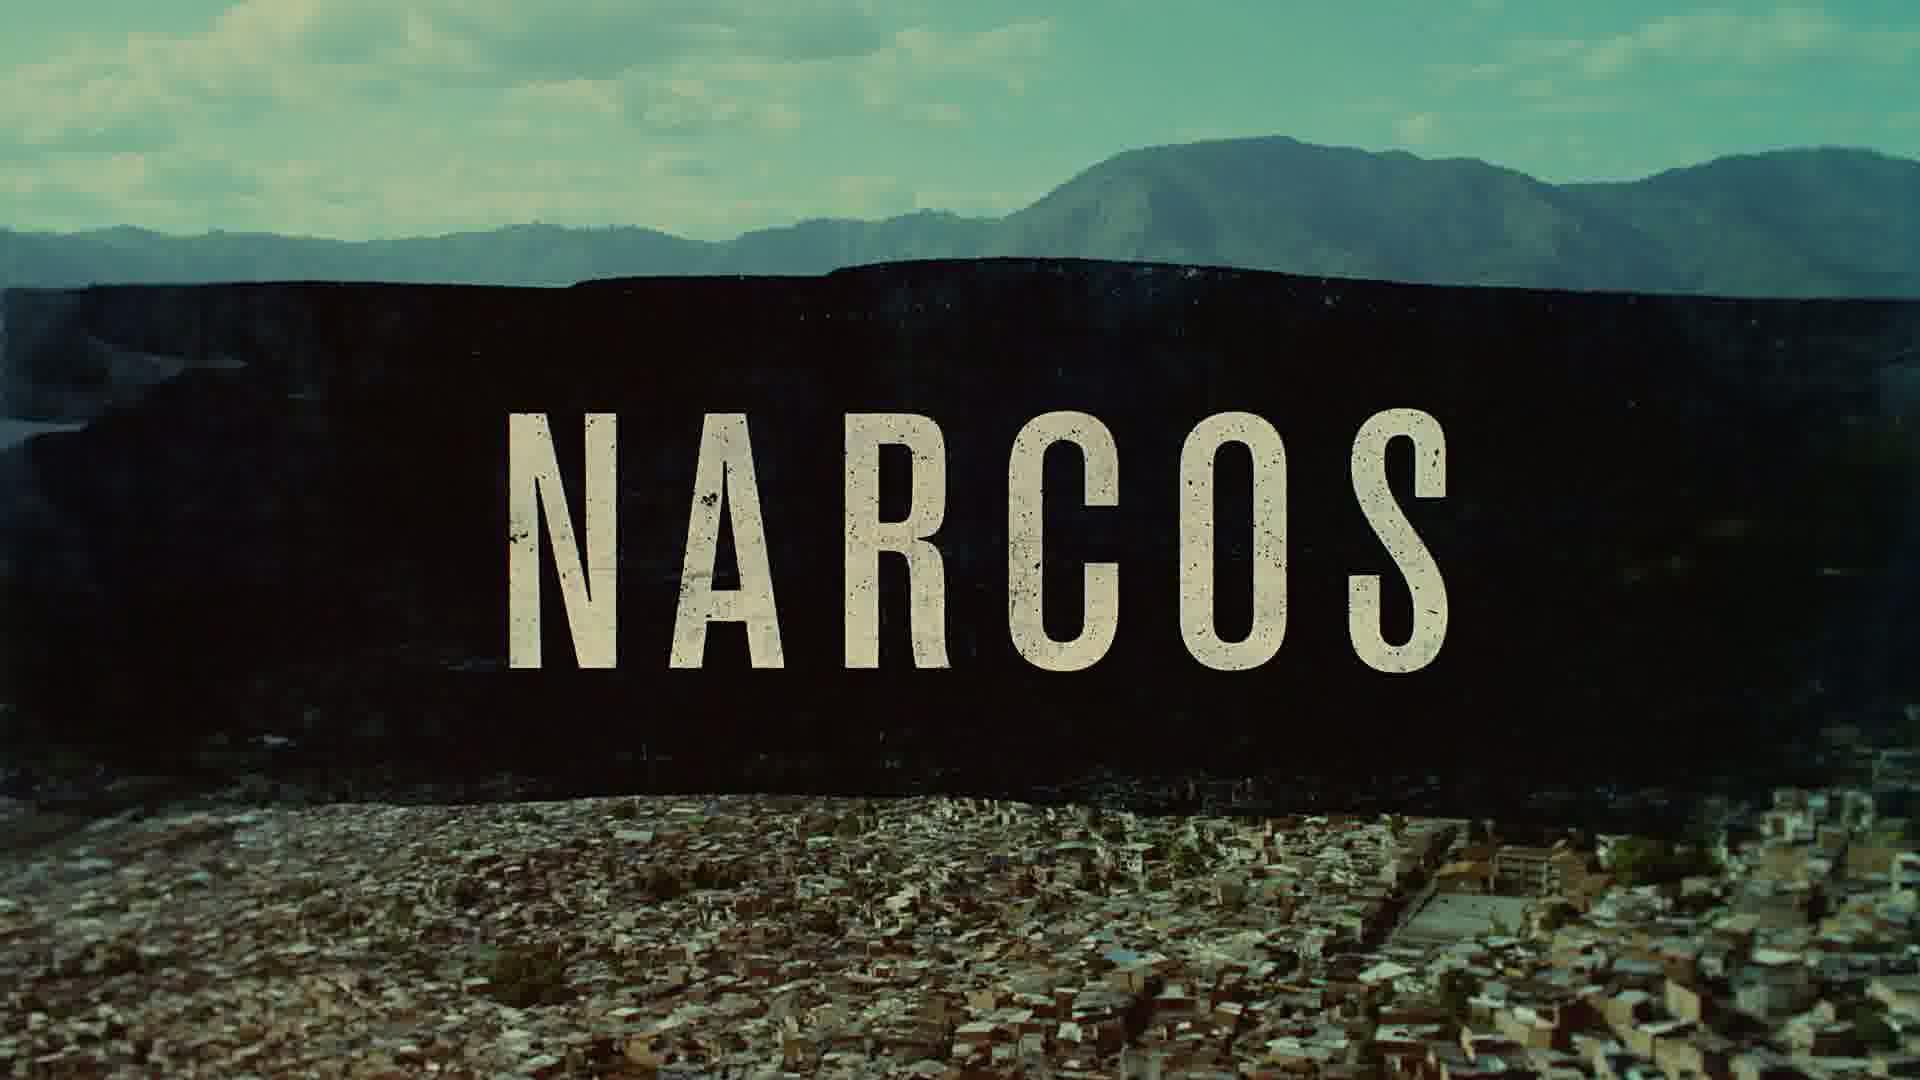 Narcos Wallpapers - Wallpaper Cave